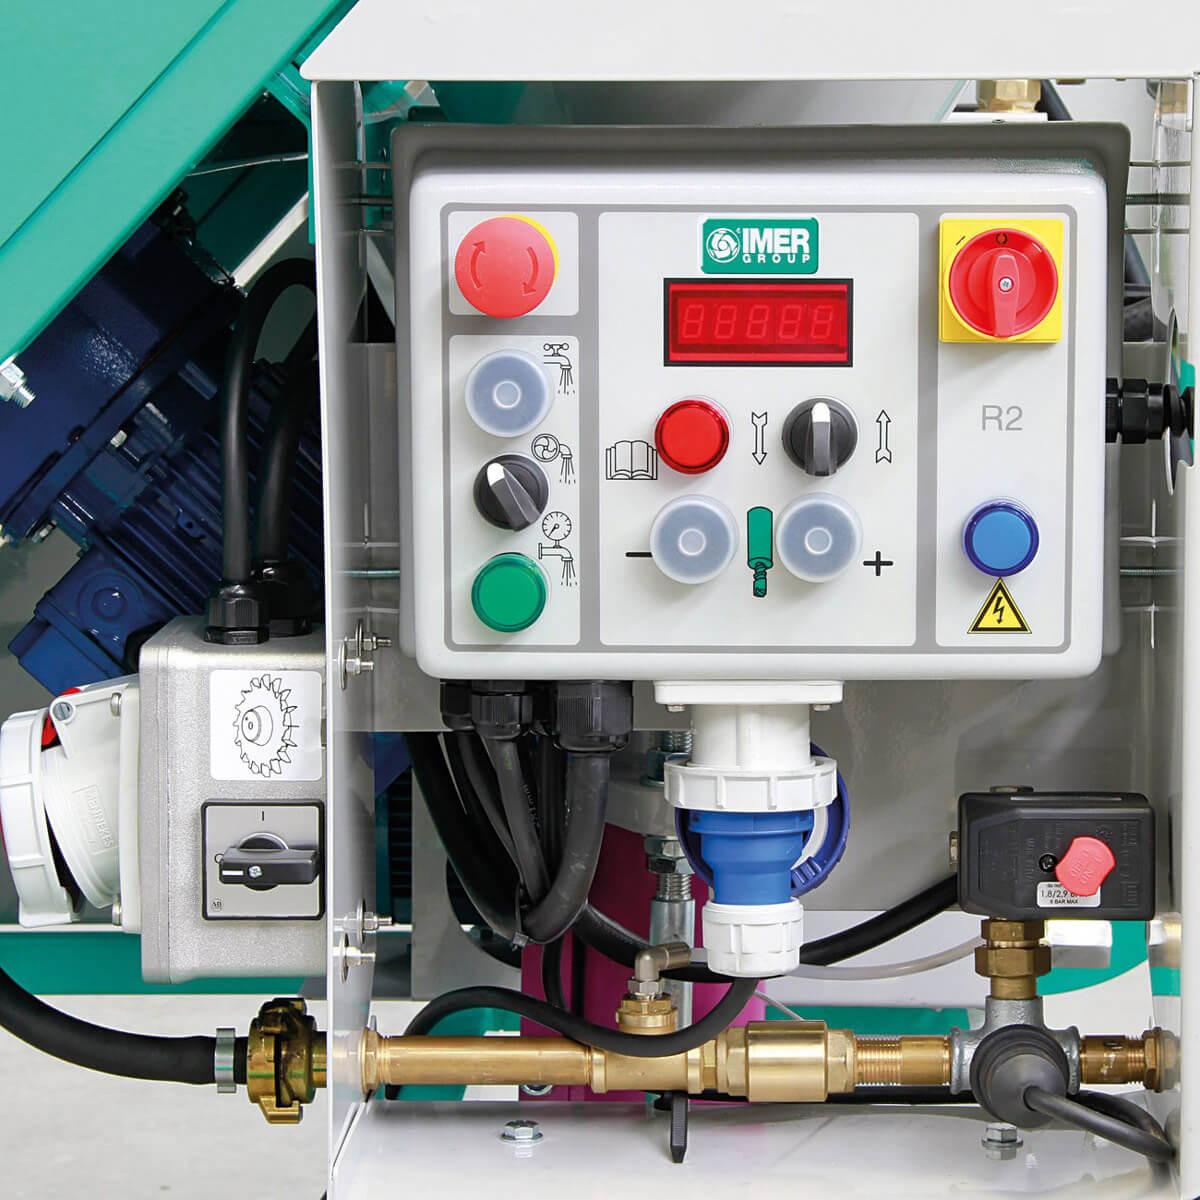 Koine 35 220v Continuous Mixer pump